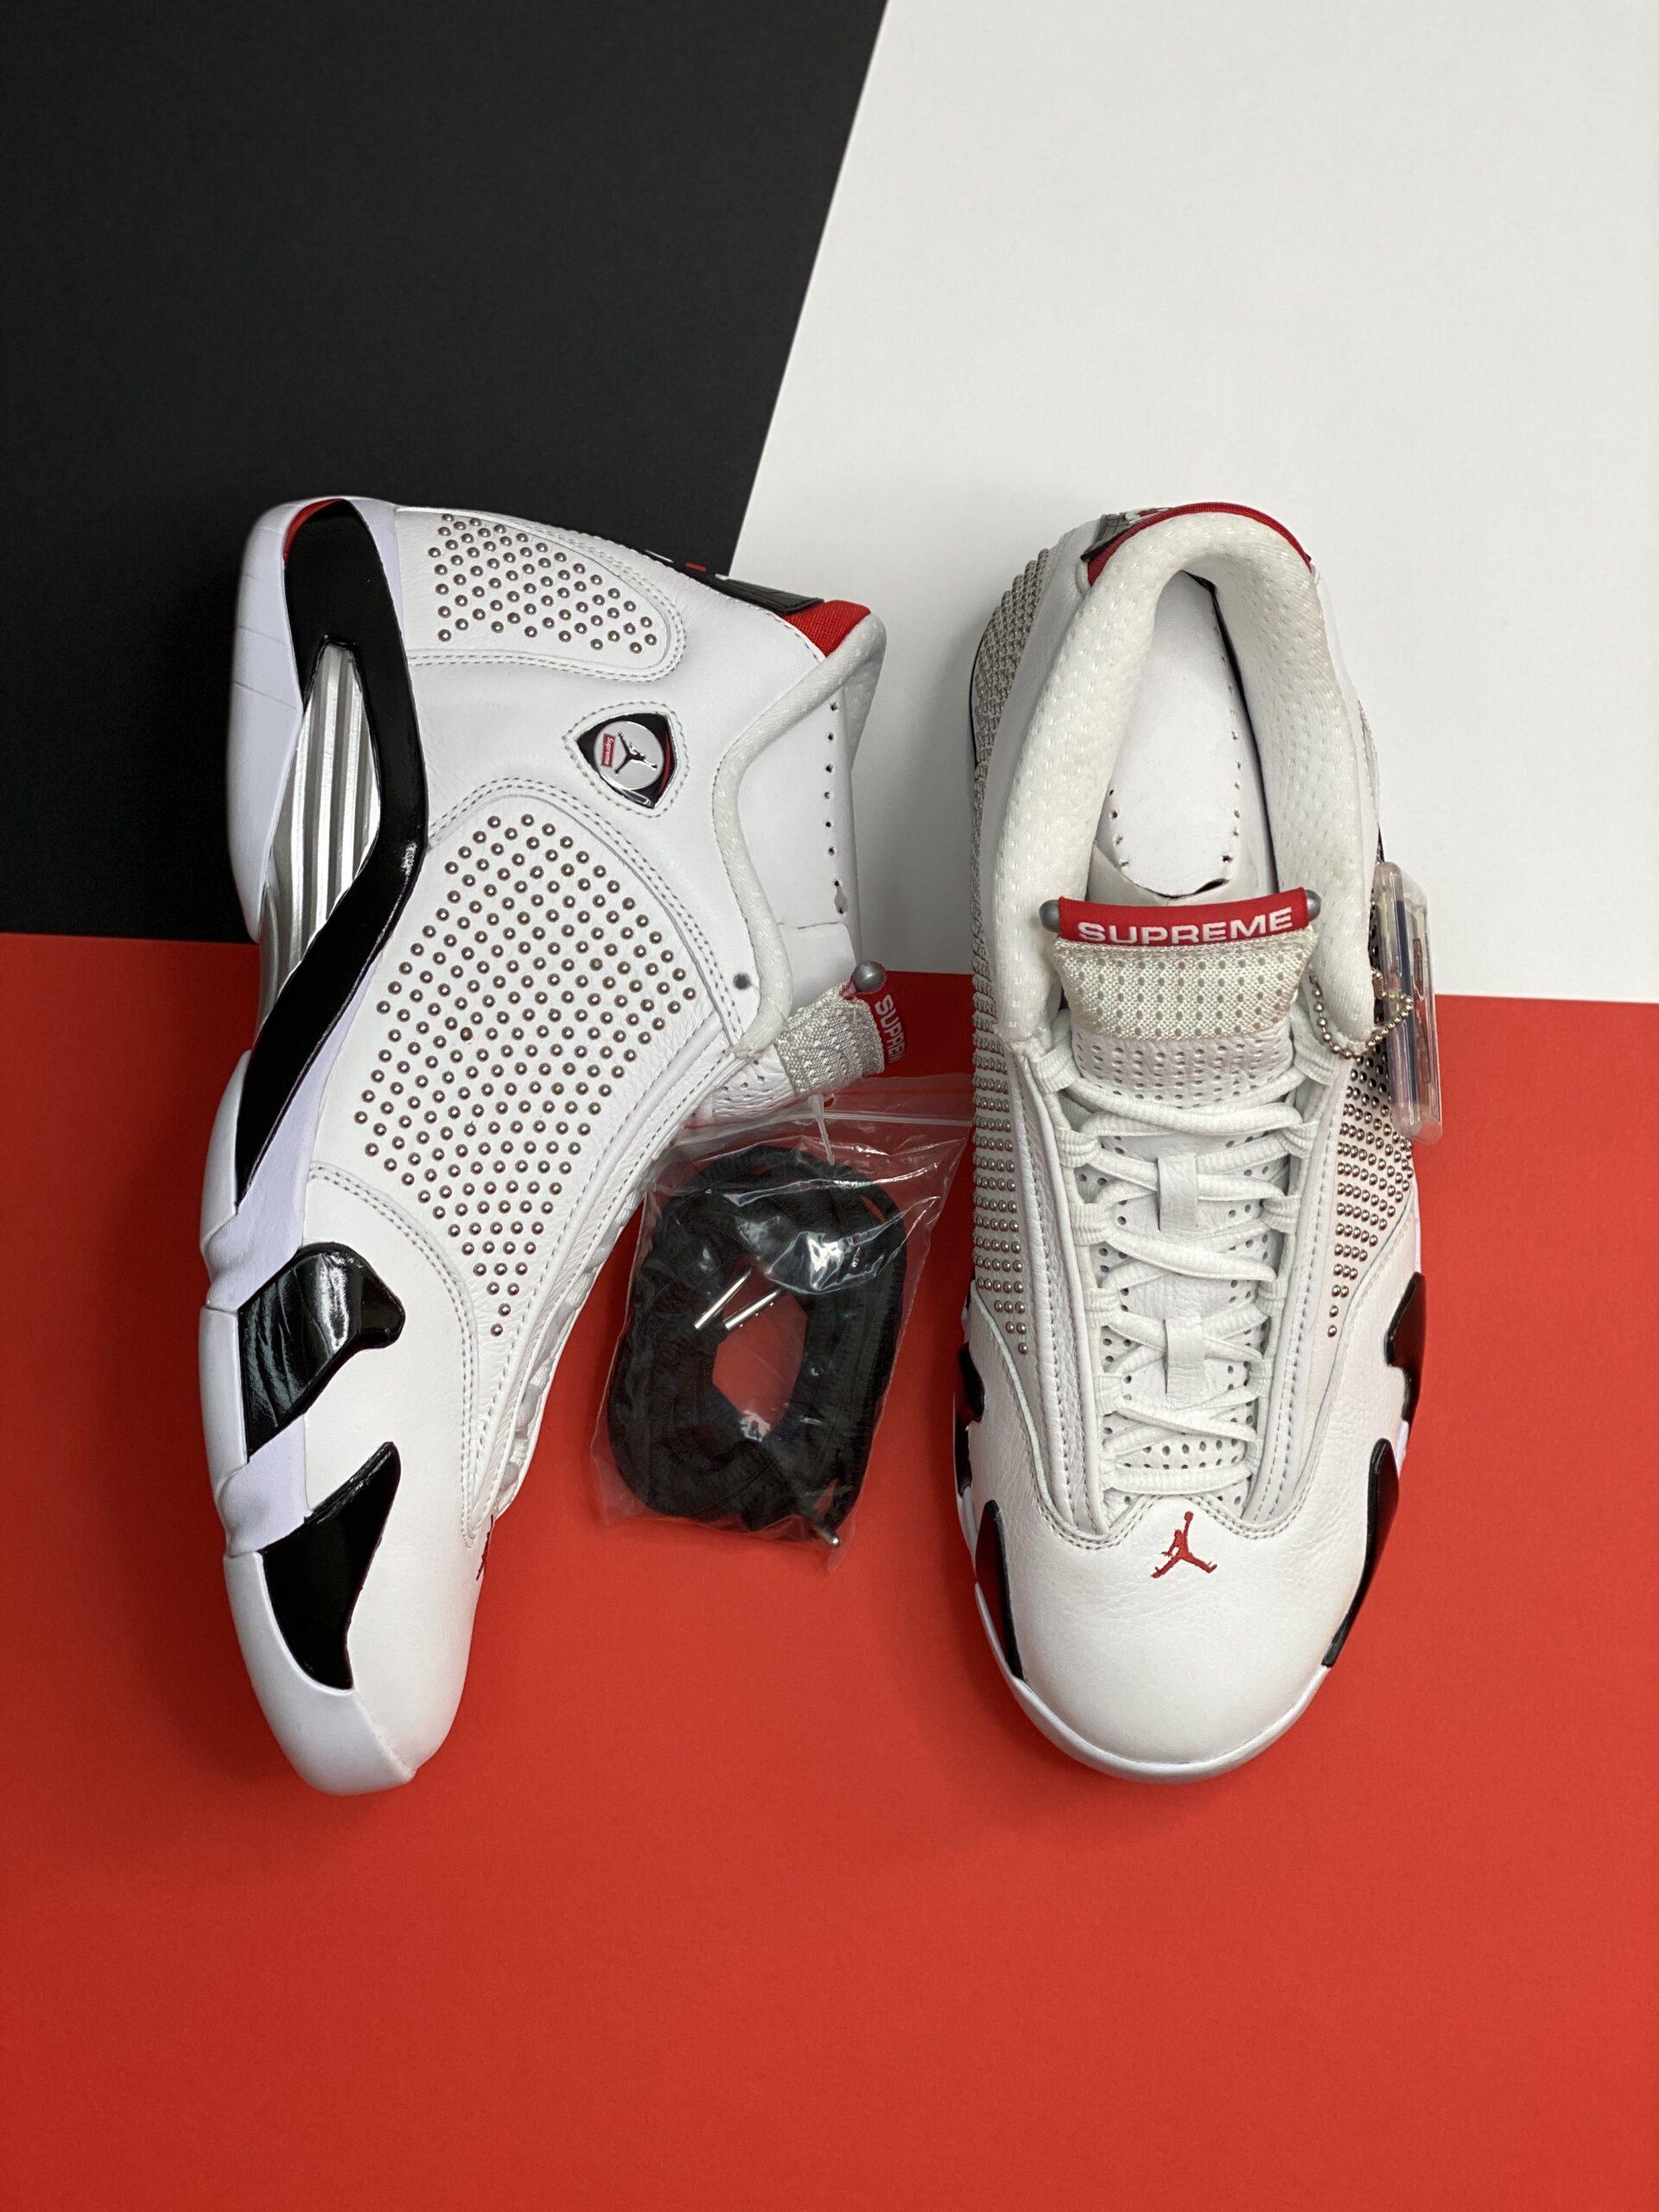 Nike Jordan x SUPREME